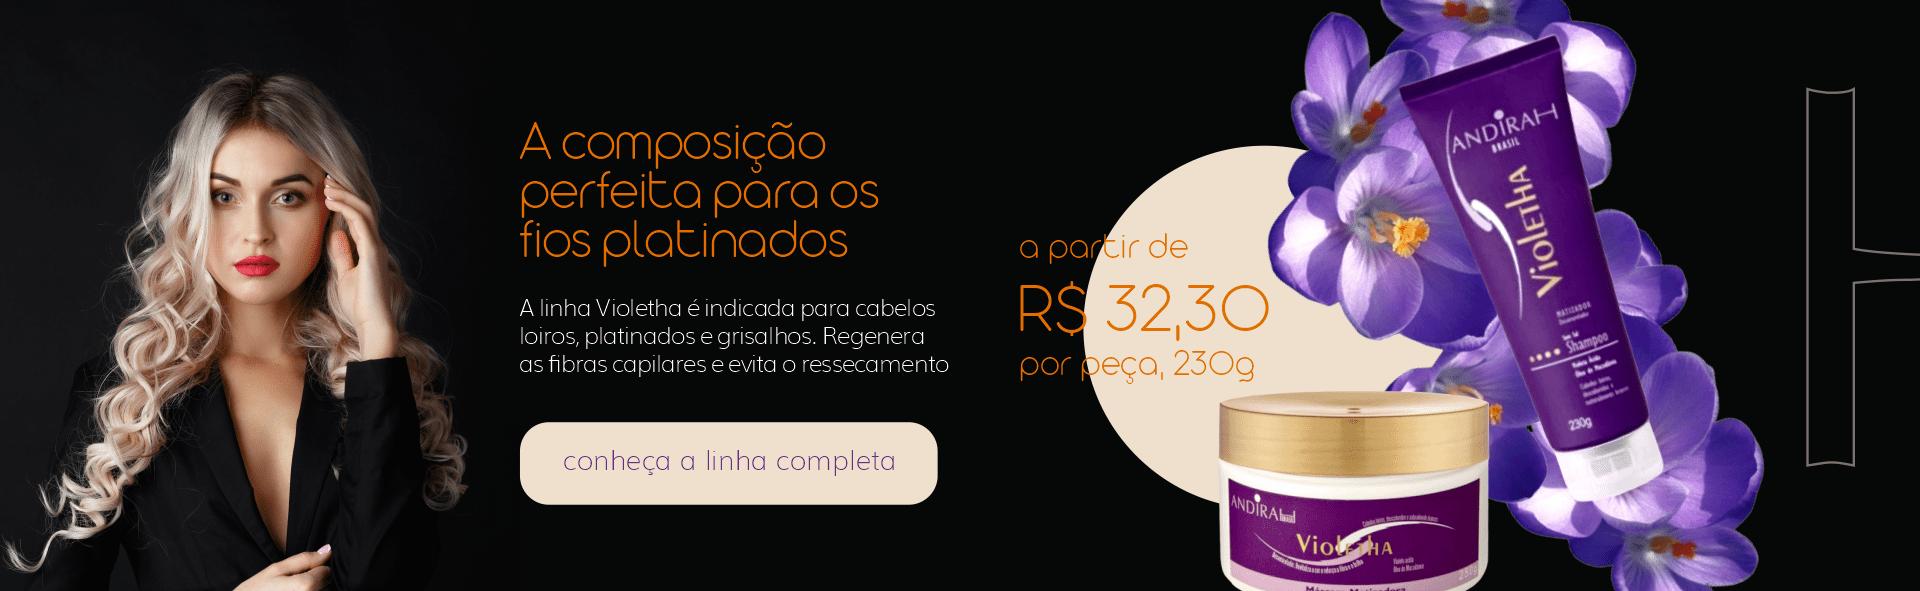 Matizador _ Violetha _ Cabelo_Loiro